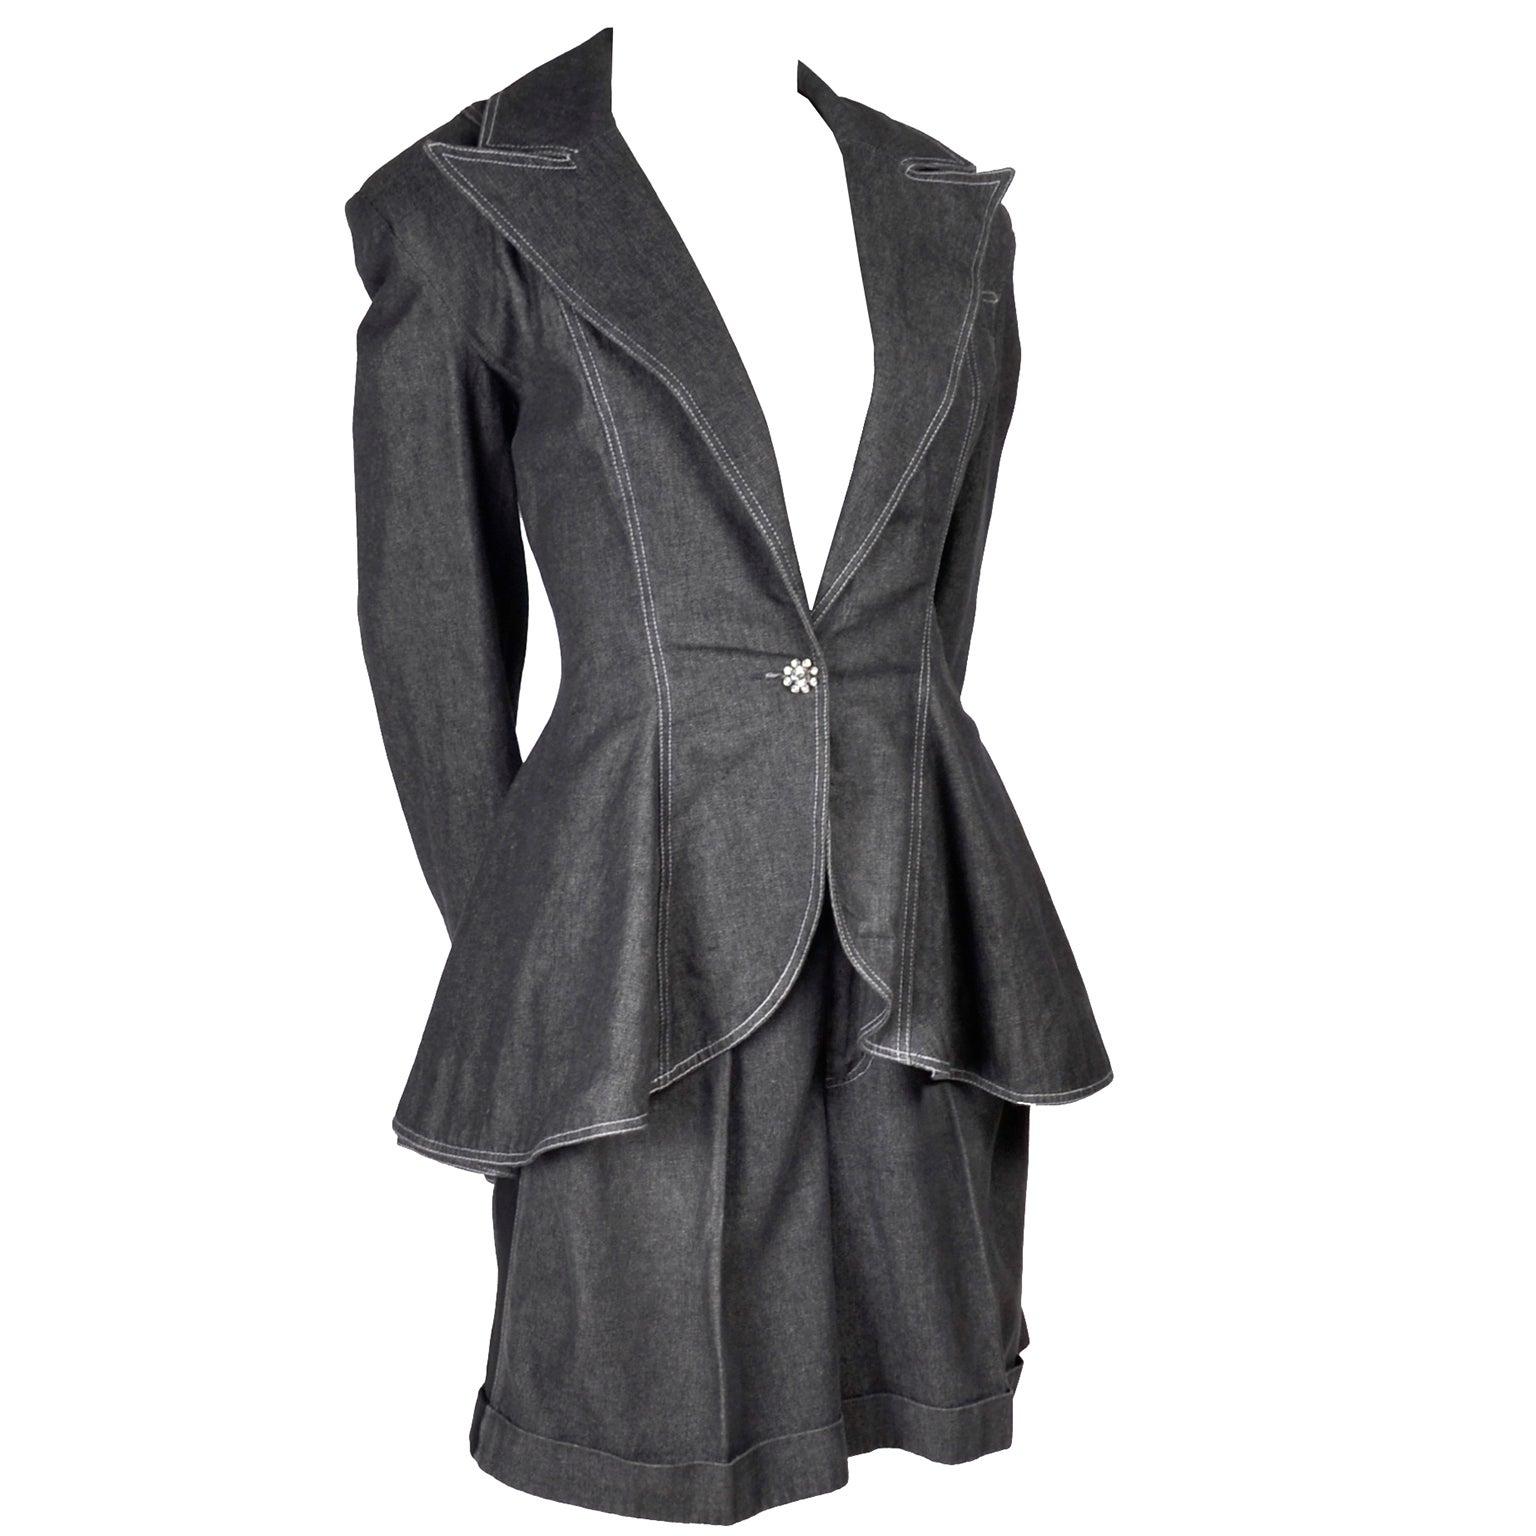 1980s Patrick Kelly Suit in Grayed Black Denim With Shorts & Peplum Jacket 4/6